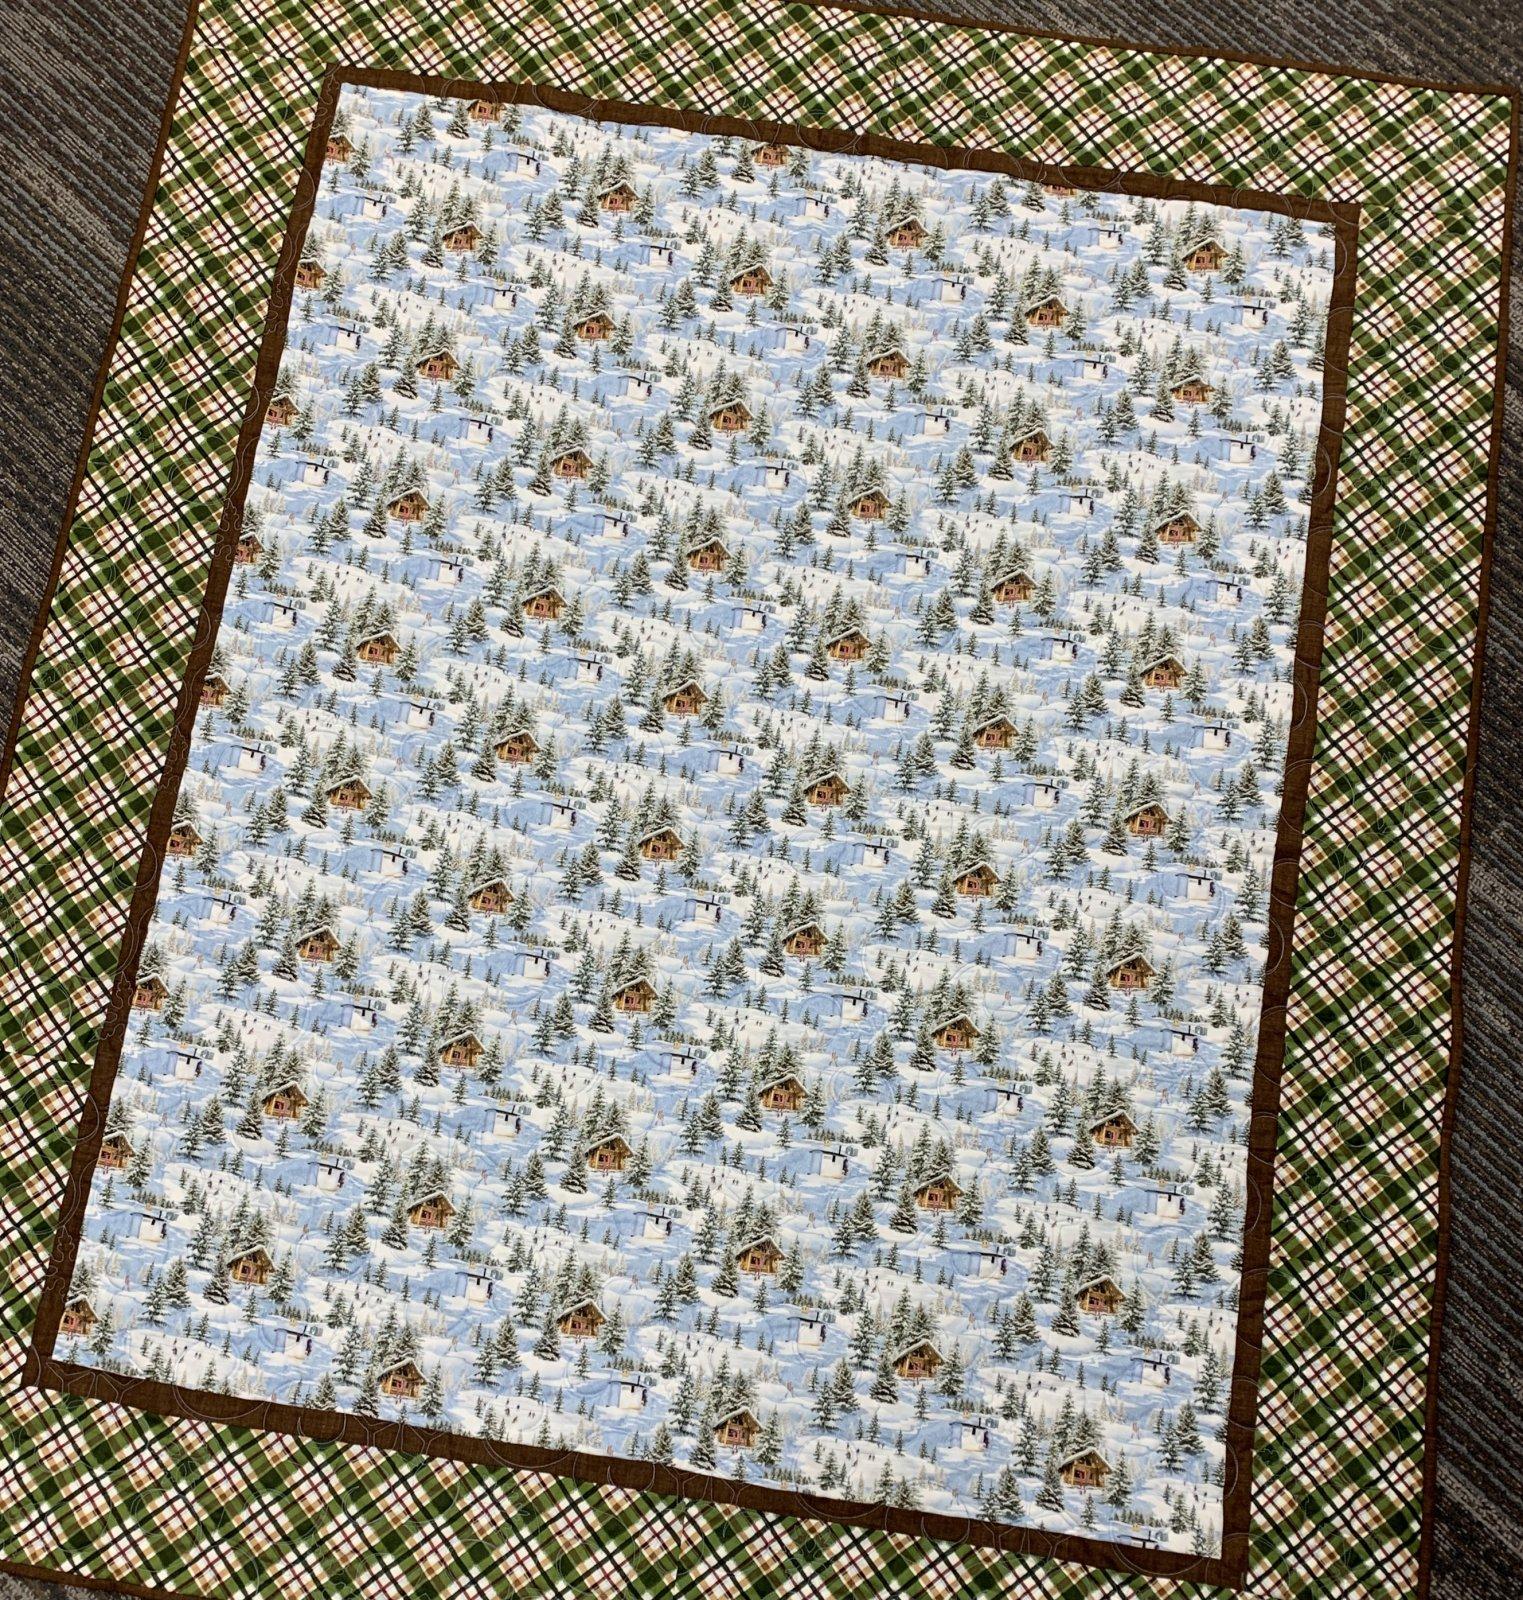 Minnesota Winter Wonderland Quilt Kit 52x62